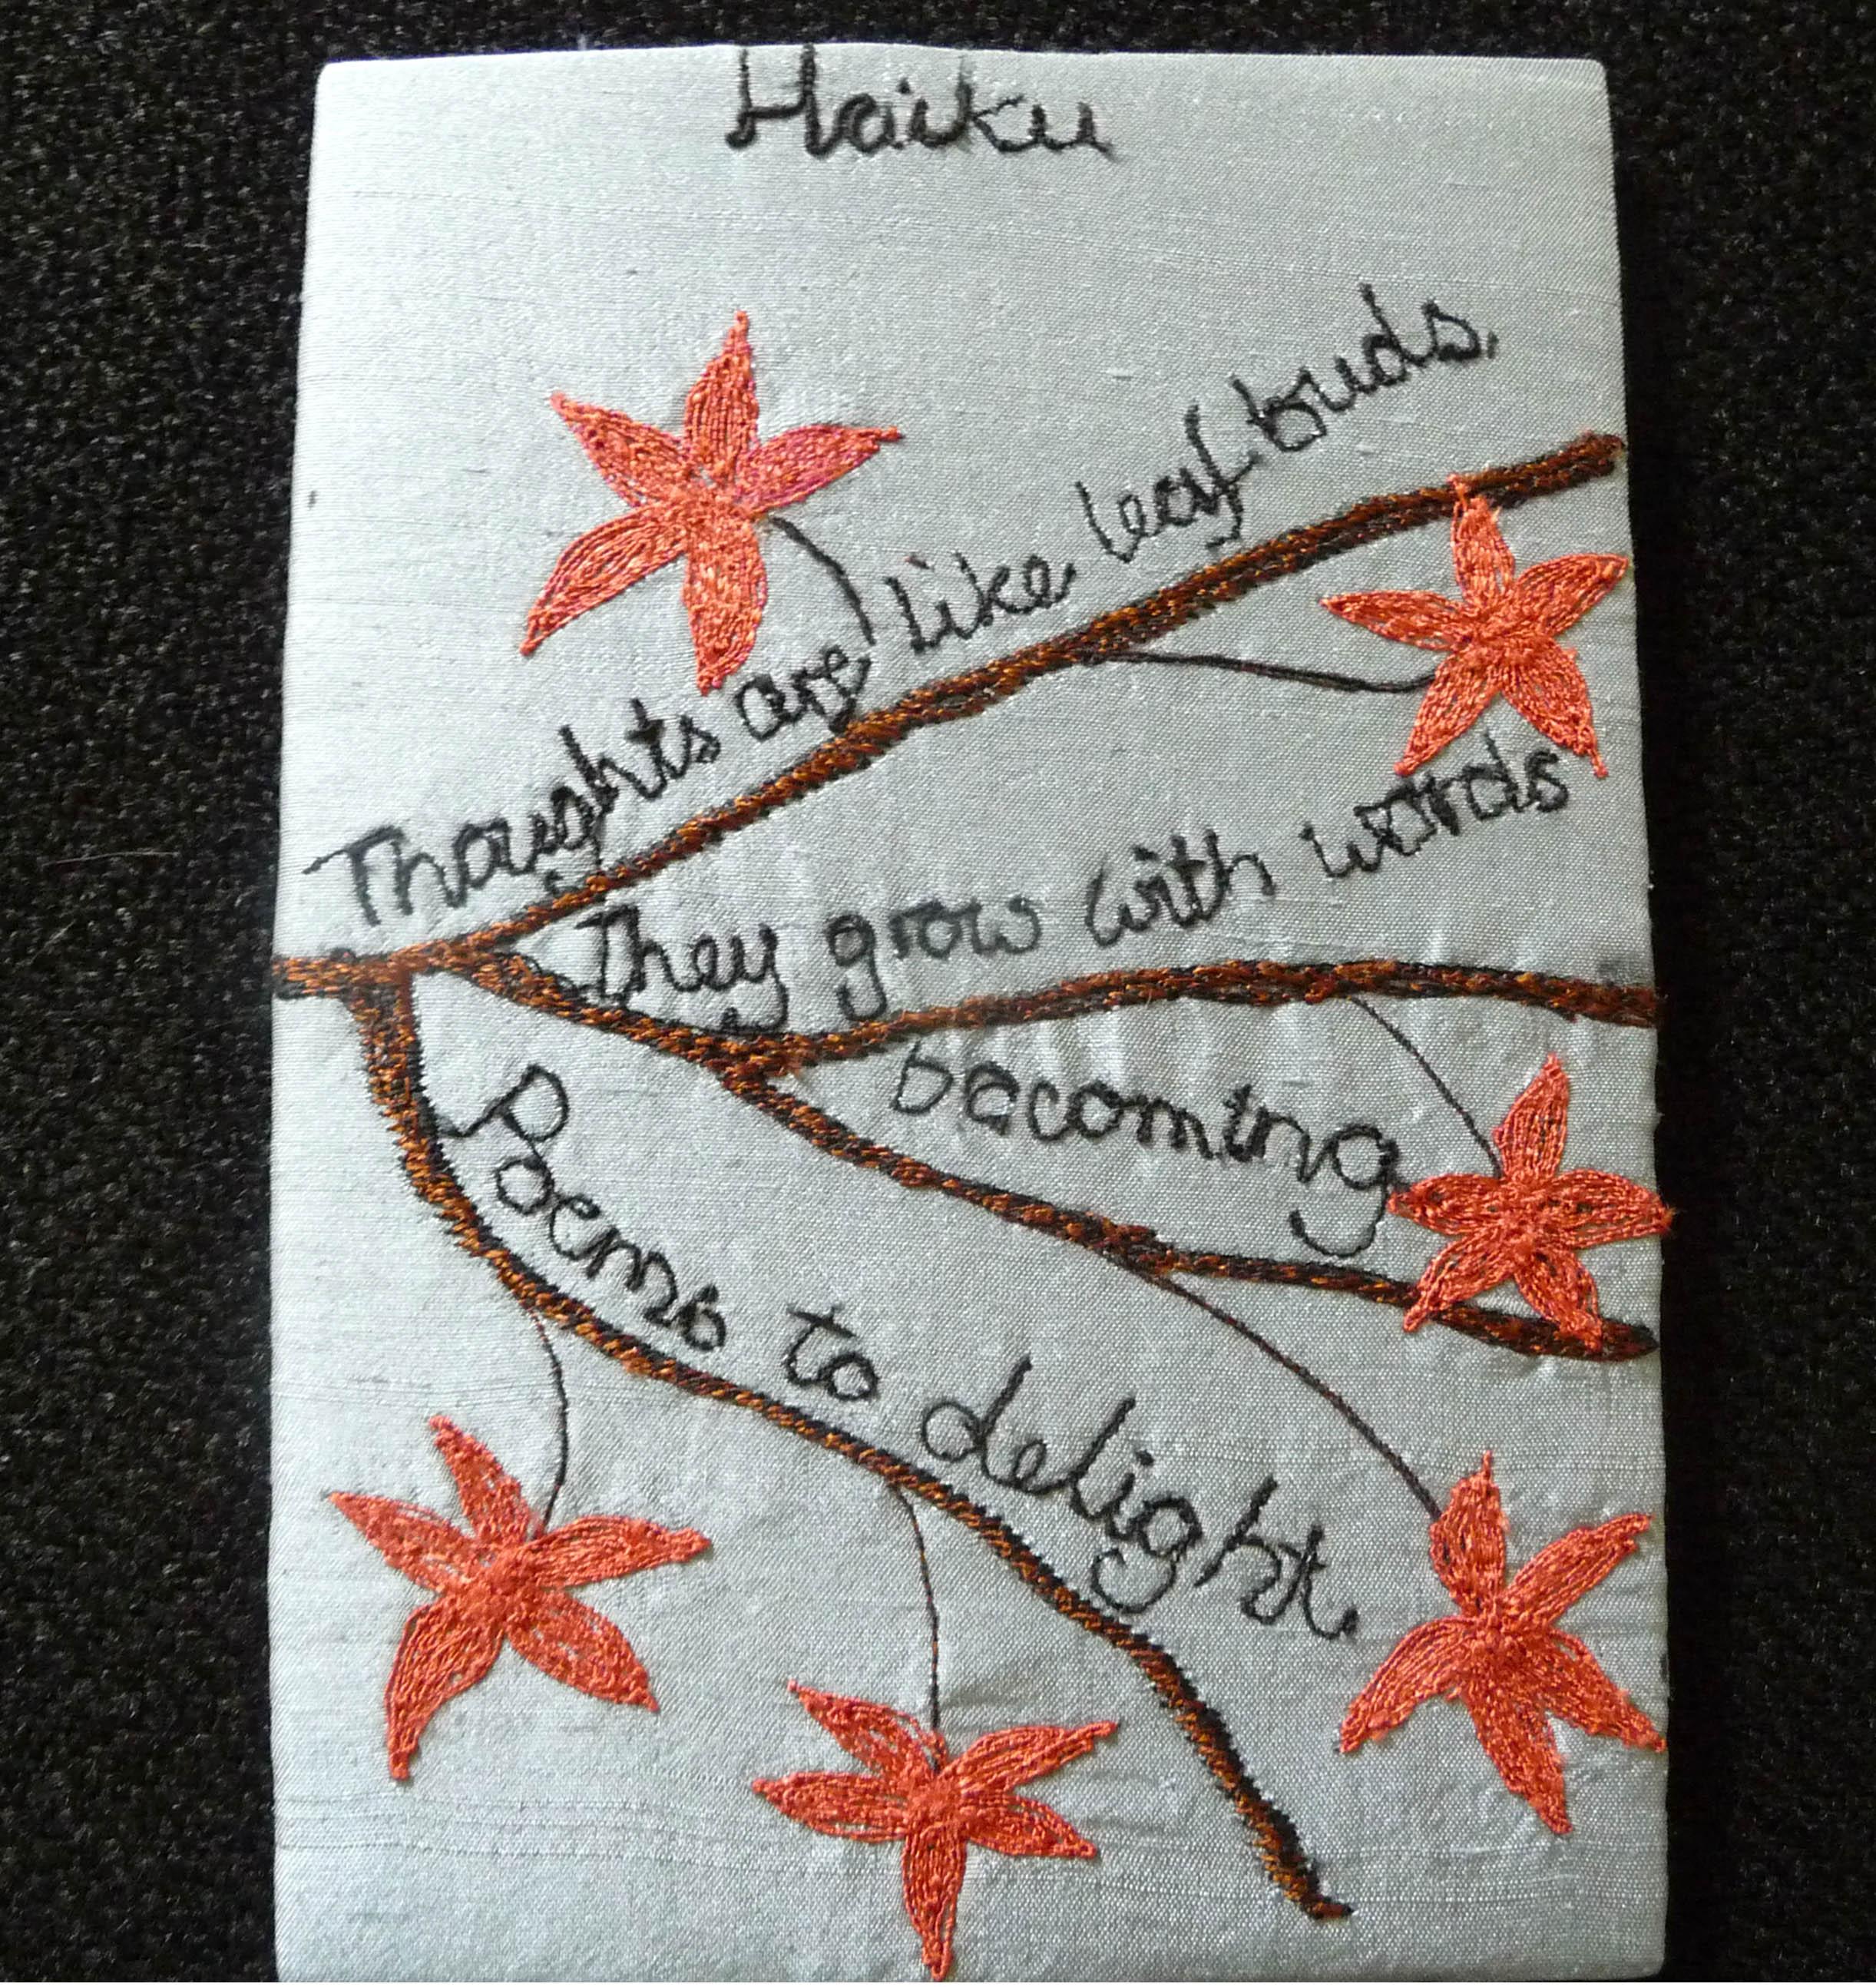 GROWTH postcard by Ann Rogers